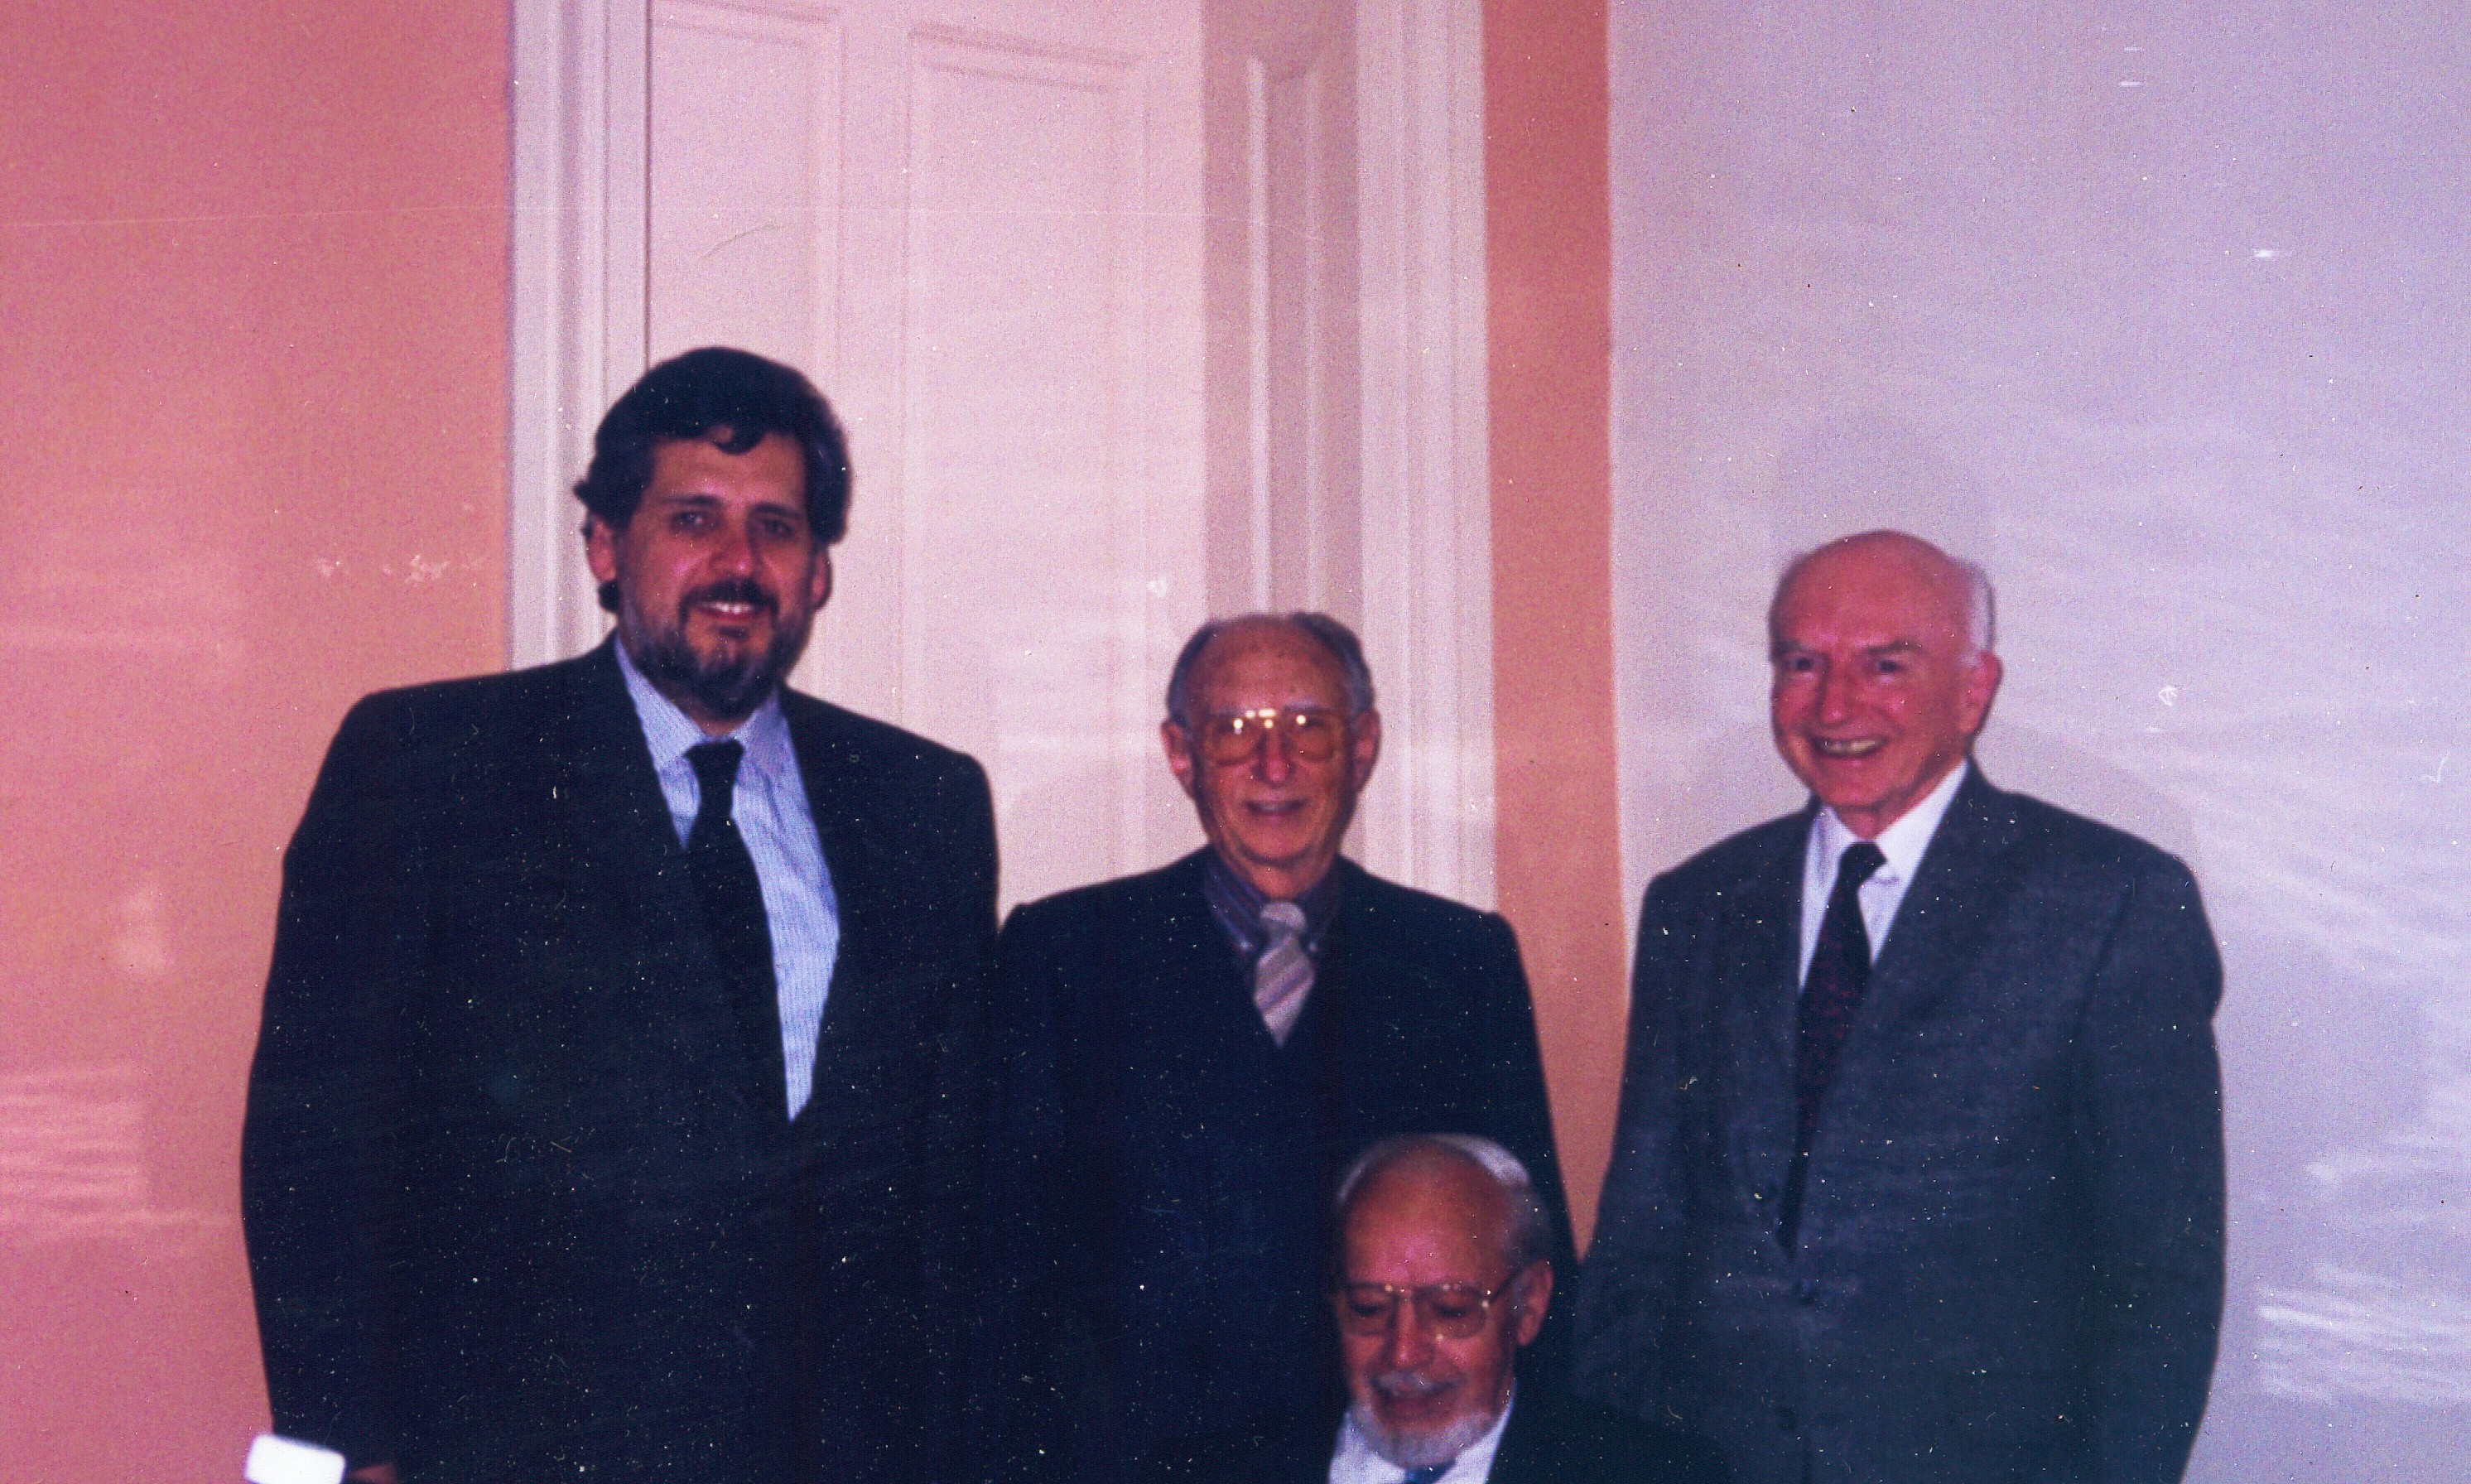 J.Ciampagna, G.Bartaburu, V.Haar, T.L. Racagni